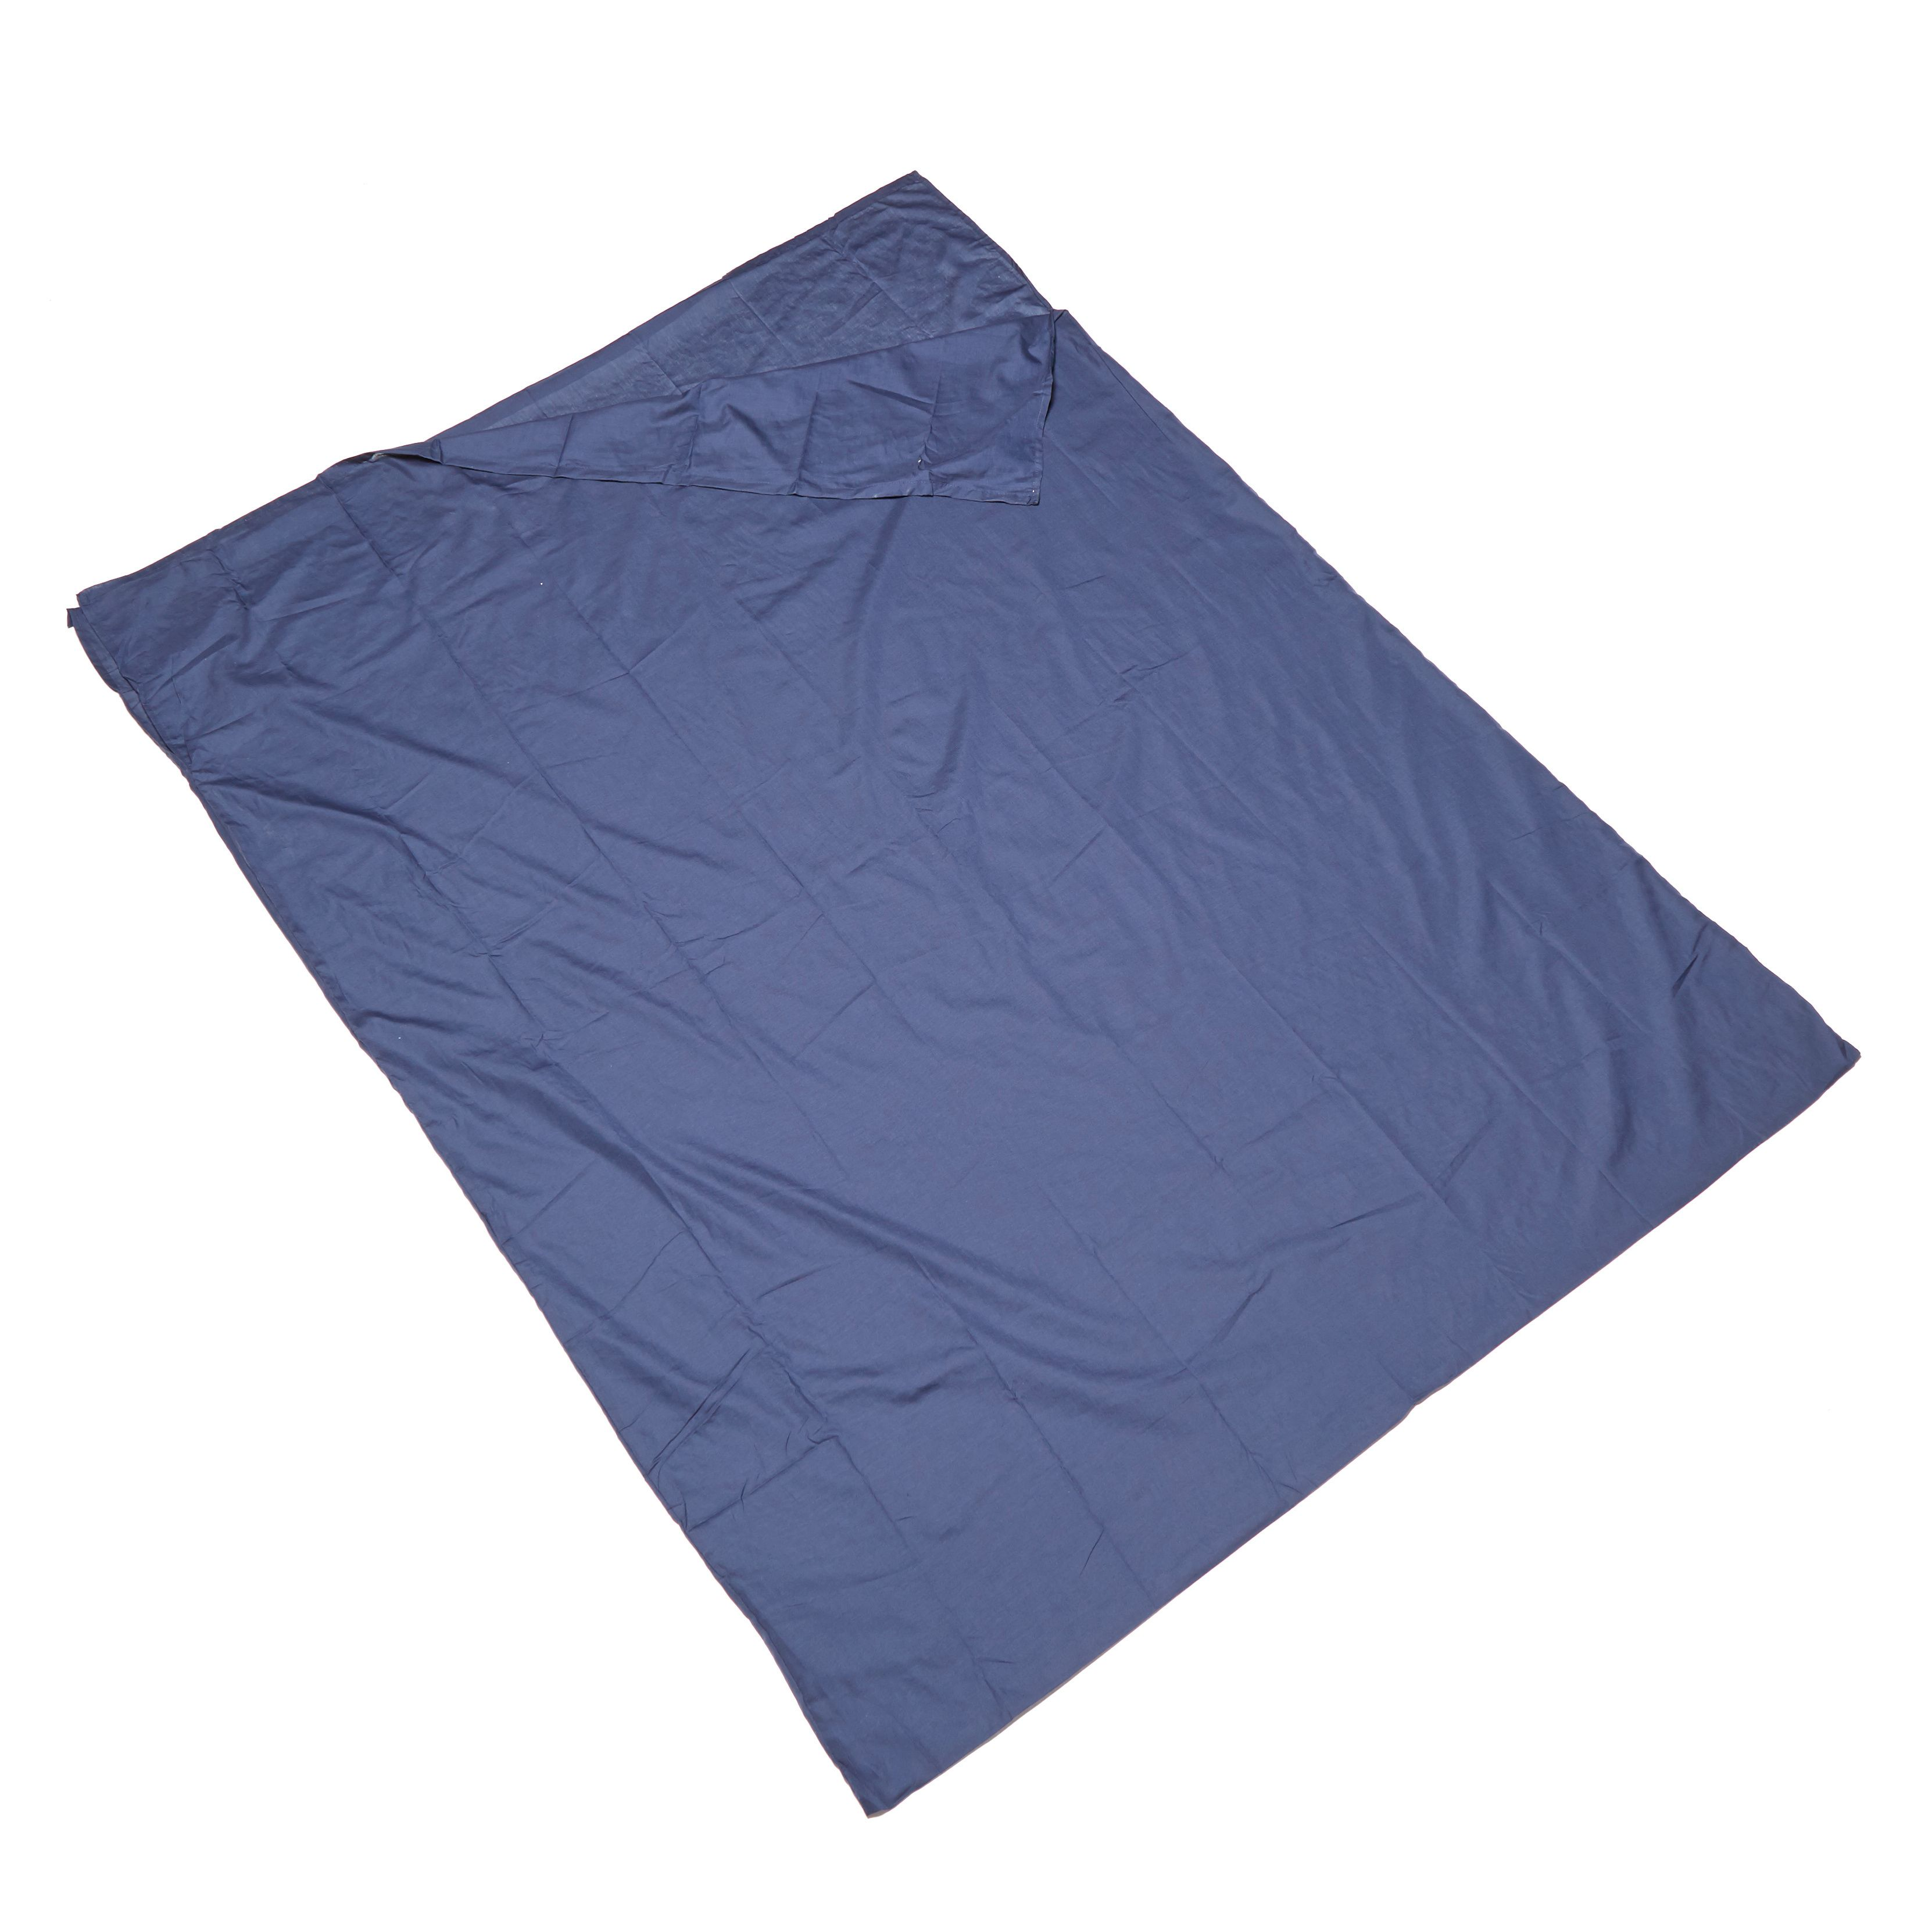 EUROHIKE Polycotton Sleeping Bag Liner - Double